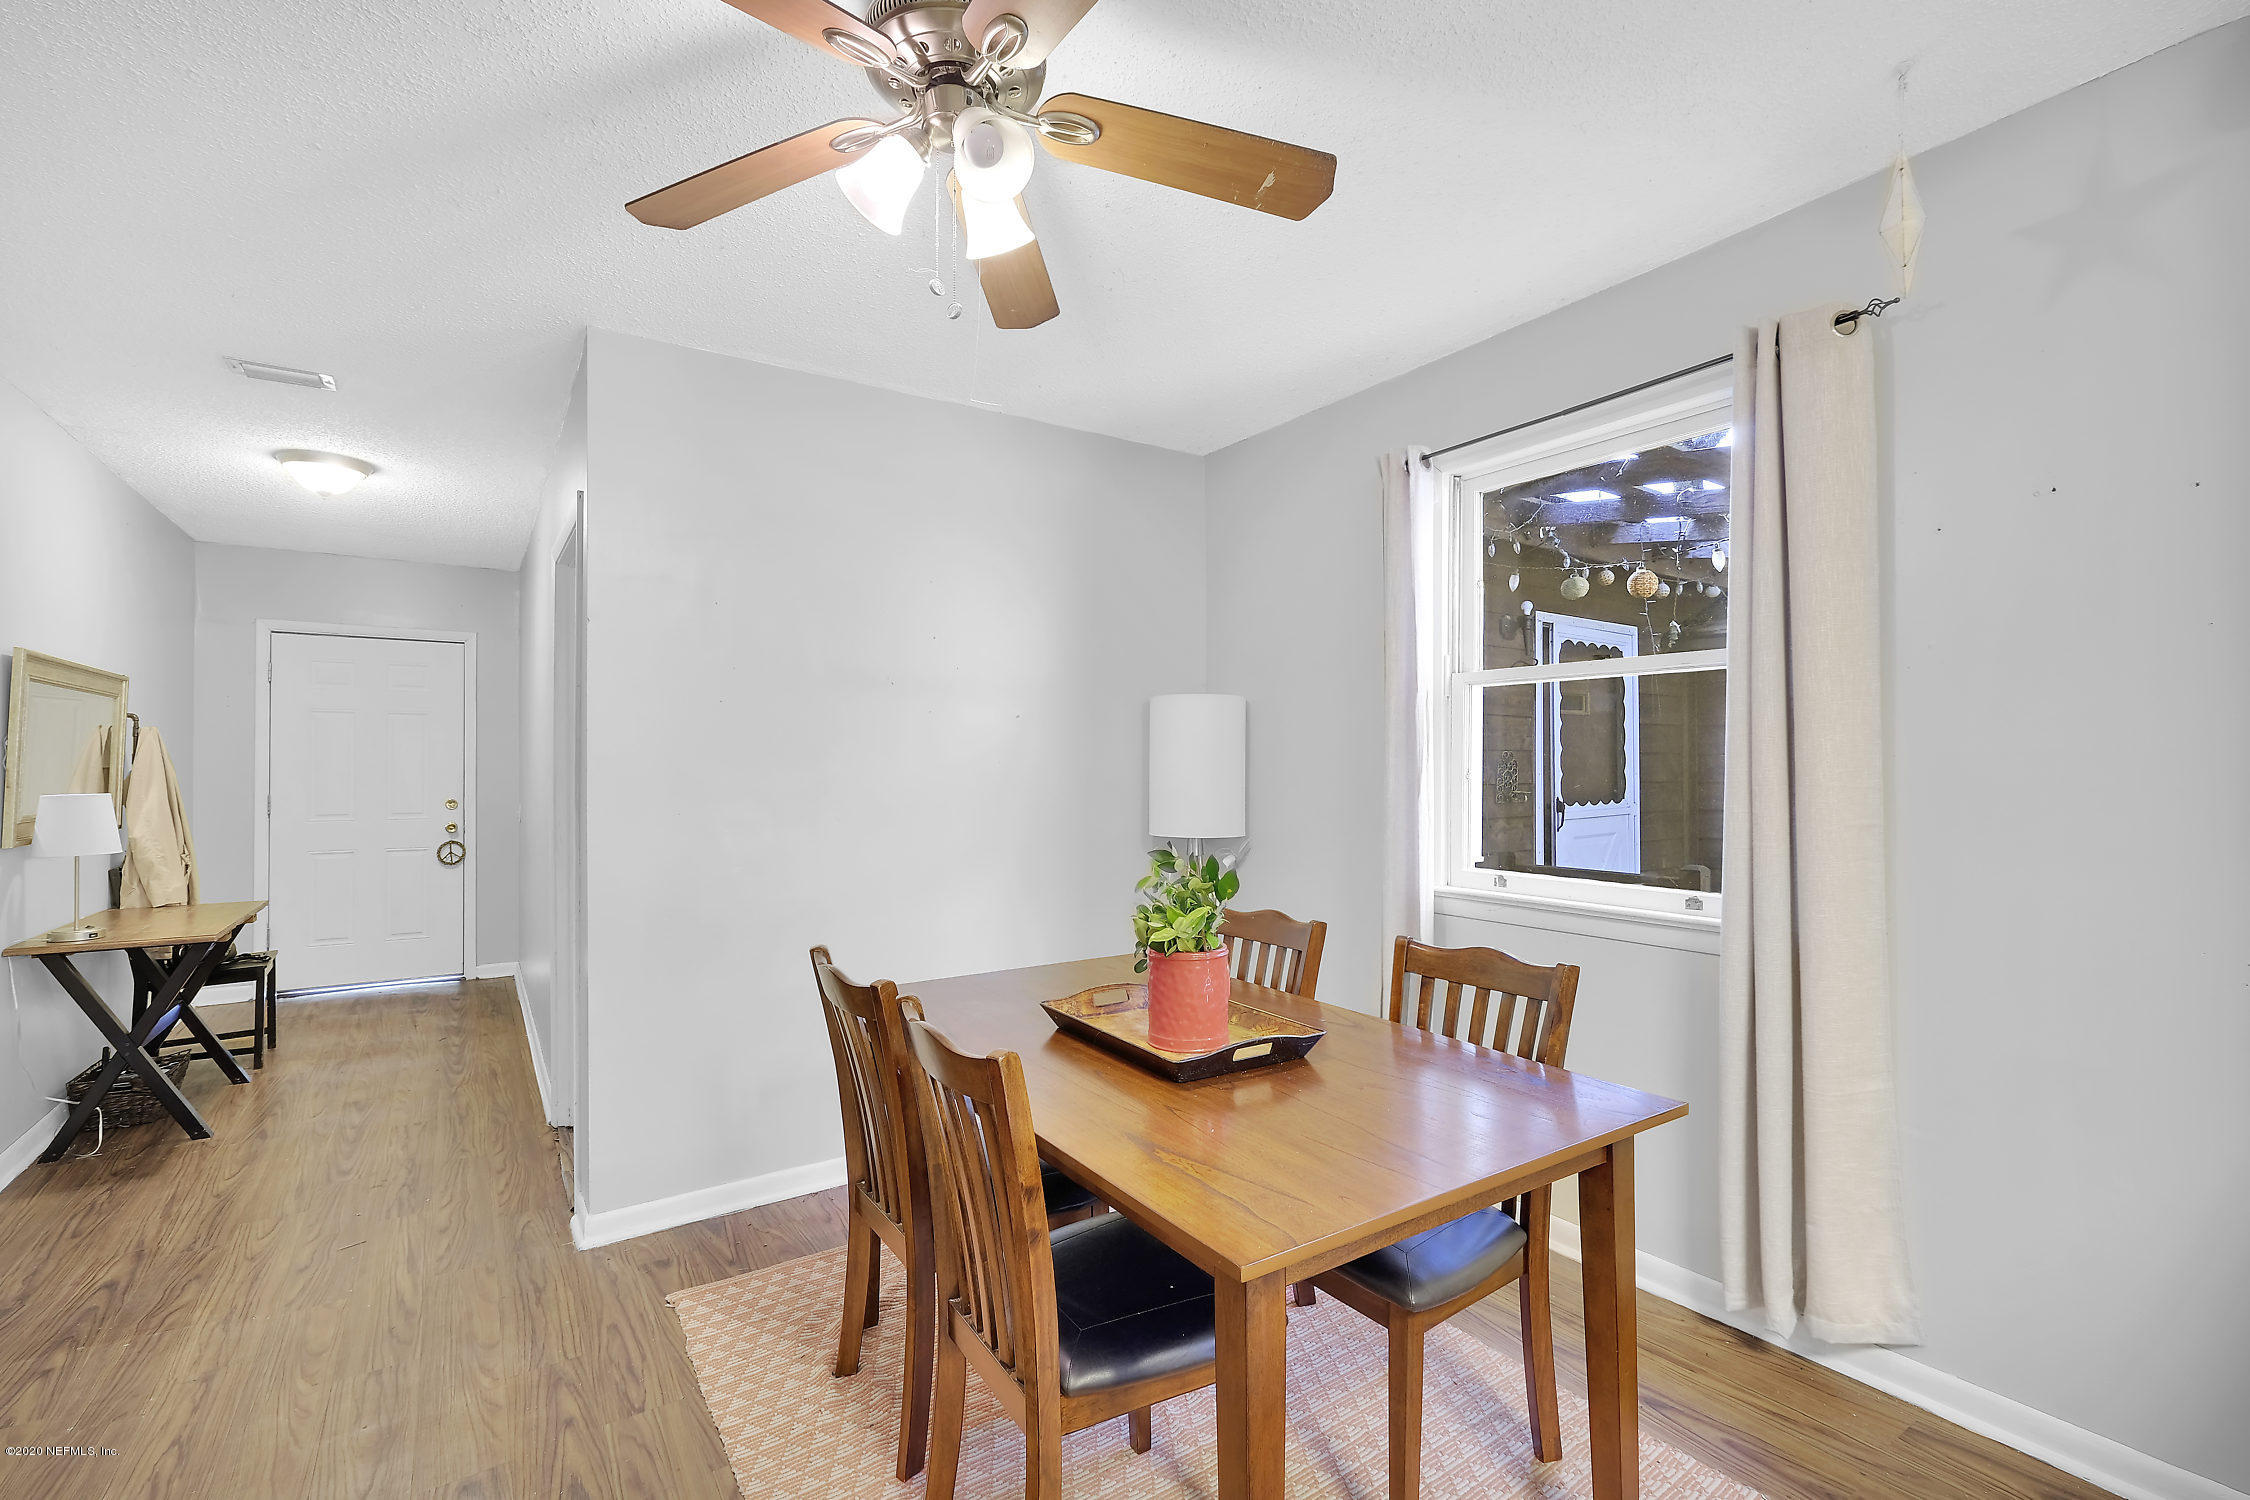 1449 LIVE OAK, JACKSONVILLE, FLORIDA 32207, 3 Bedrooms Bedrooms, ,1 BathroomBathrooms,Residential,For sale,LIVE OAK,1079676